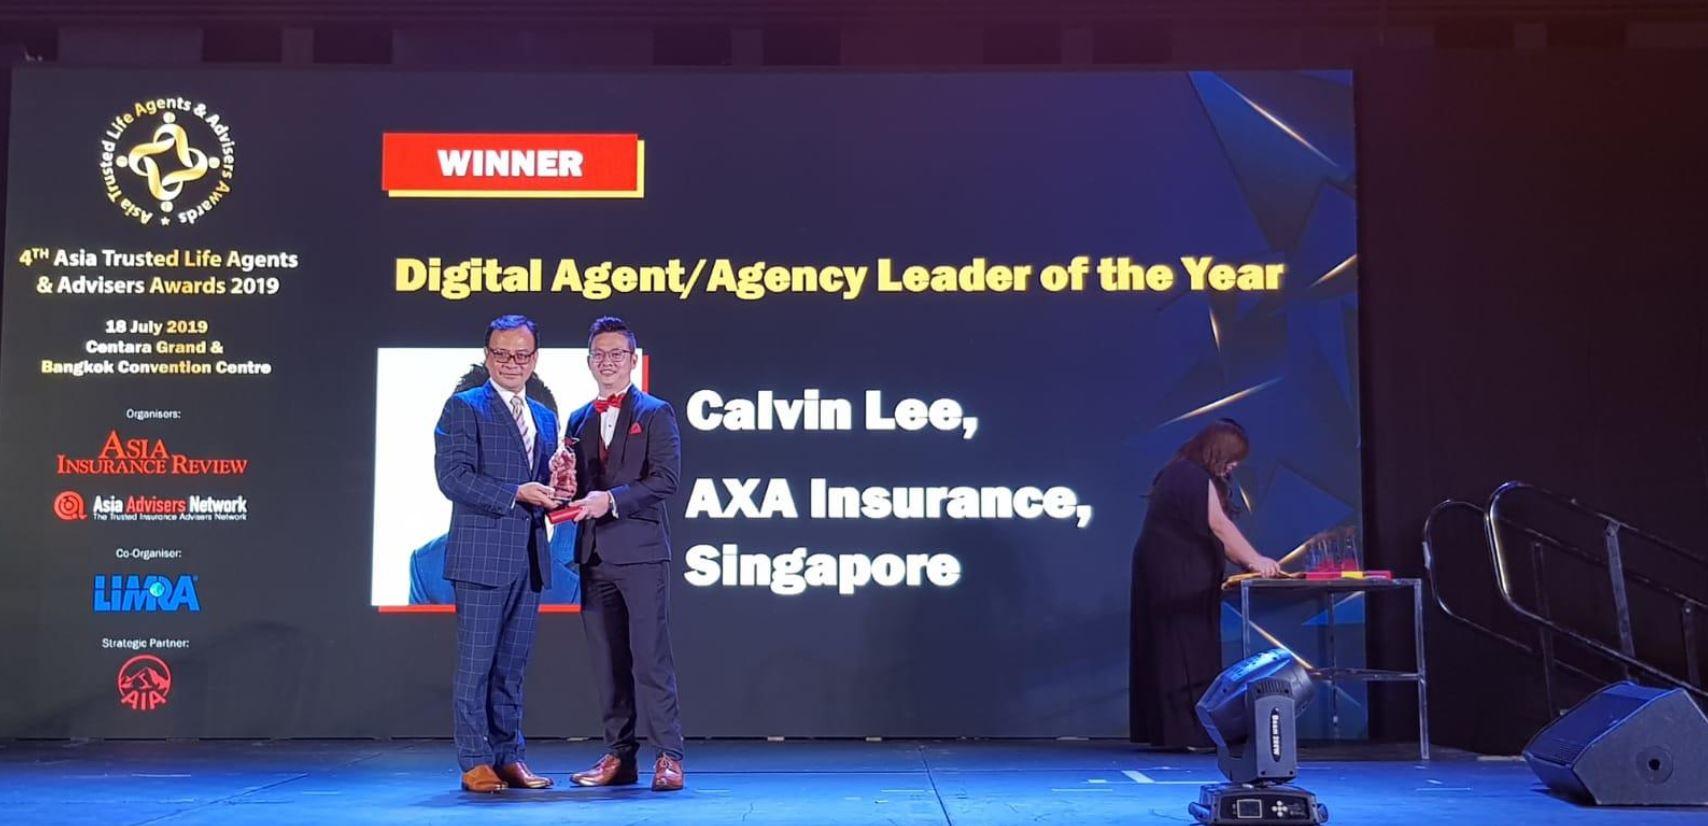 Digital Agency Leader of the Year